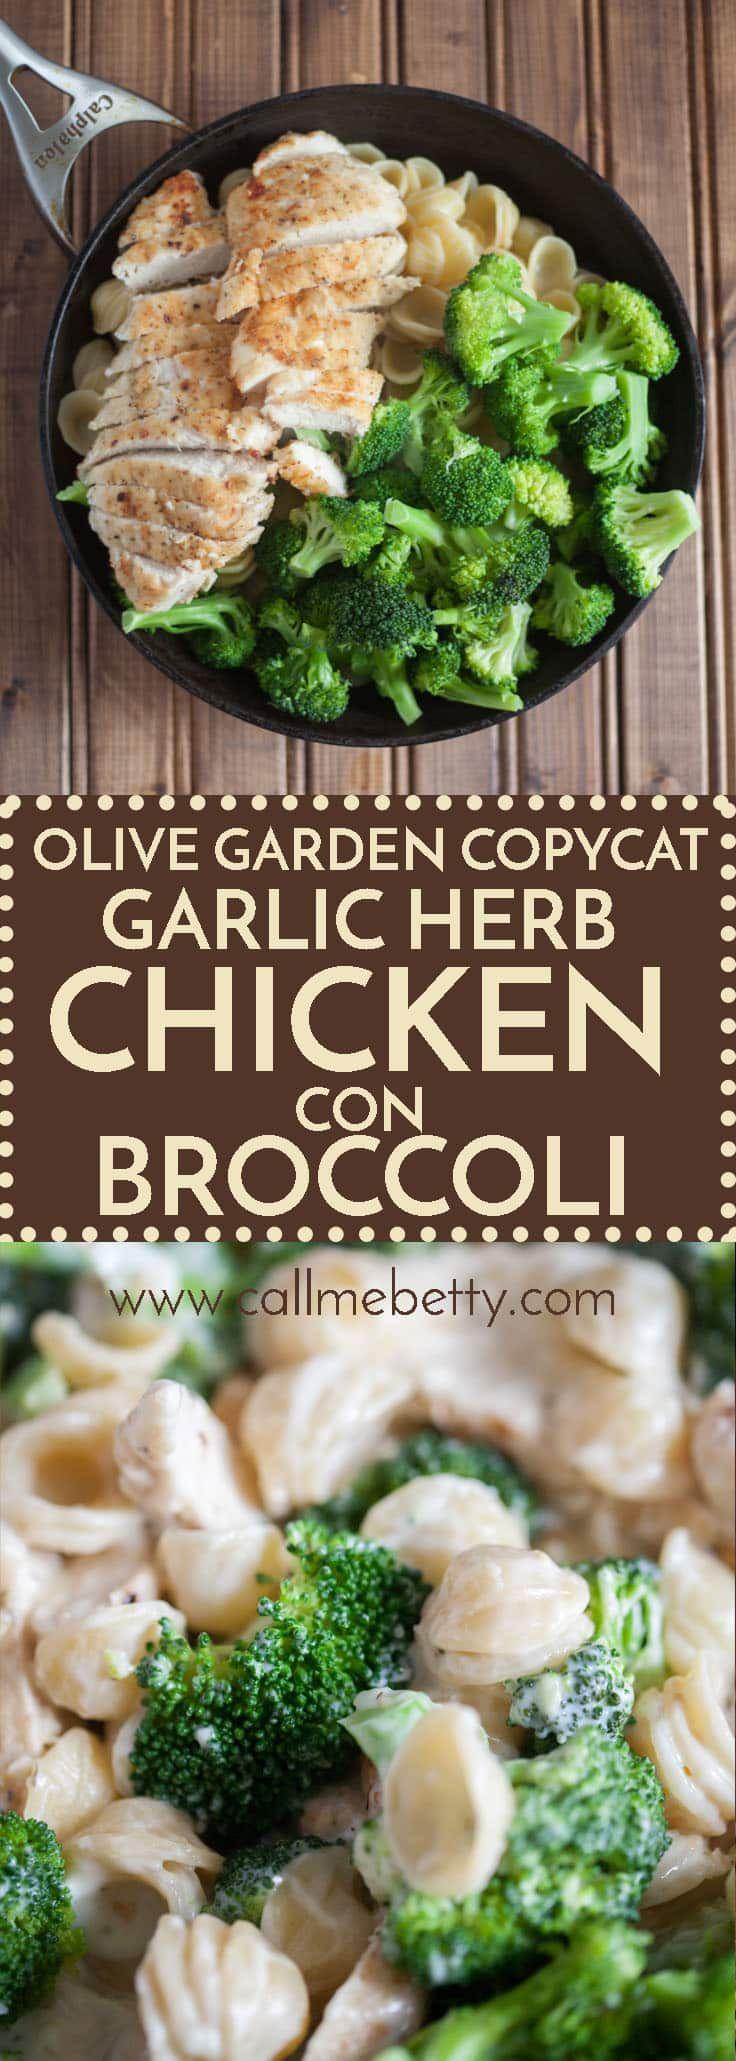 100 olive garden recipes on pinterest olive garden - Olive garden nutritional information ...